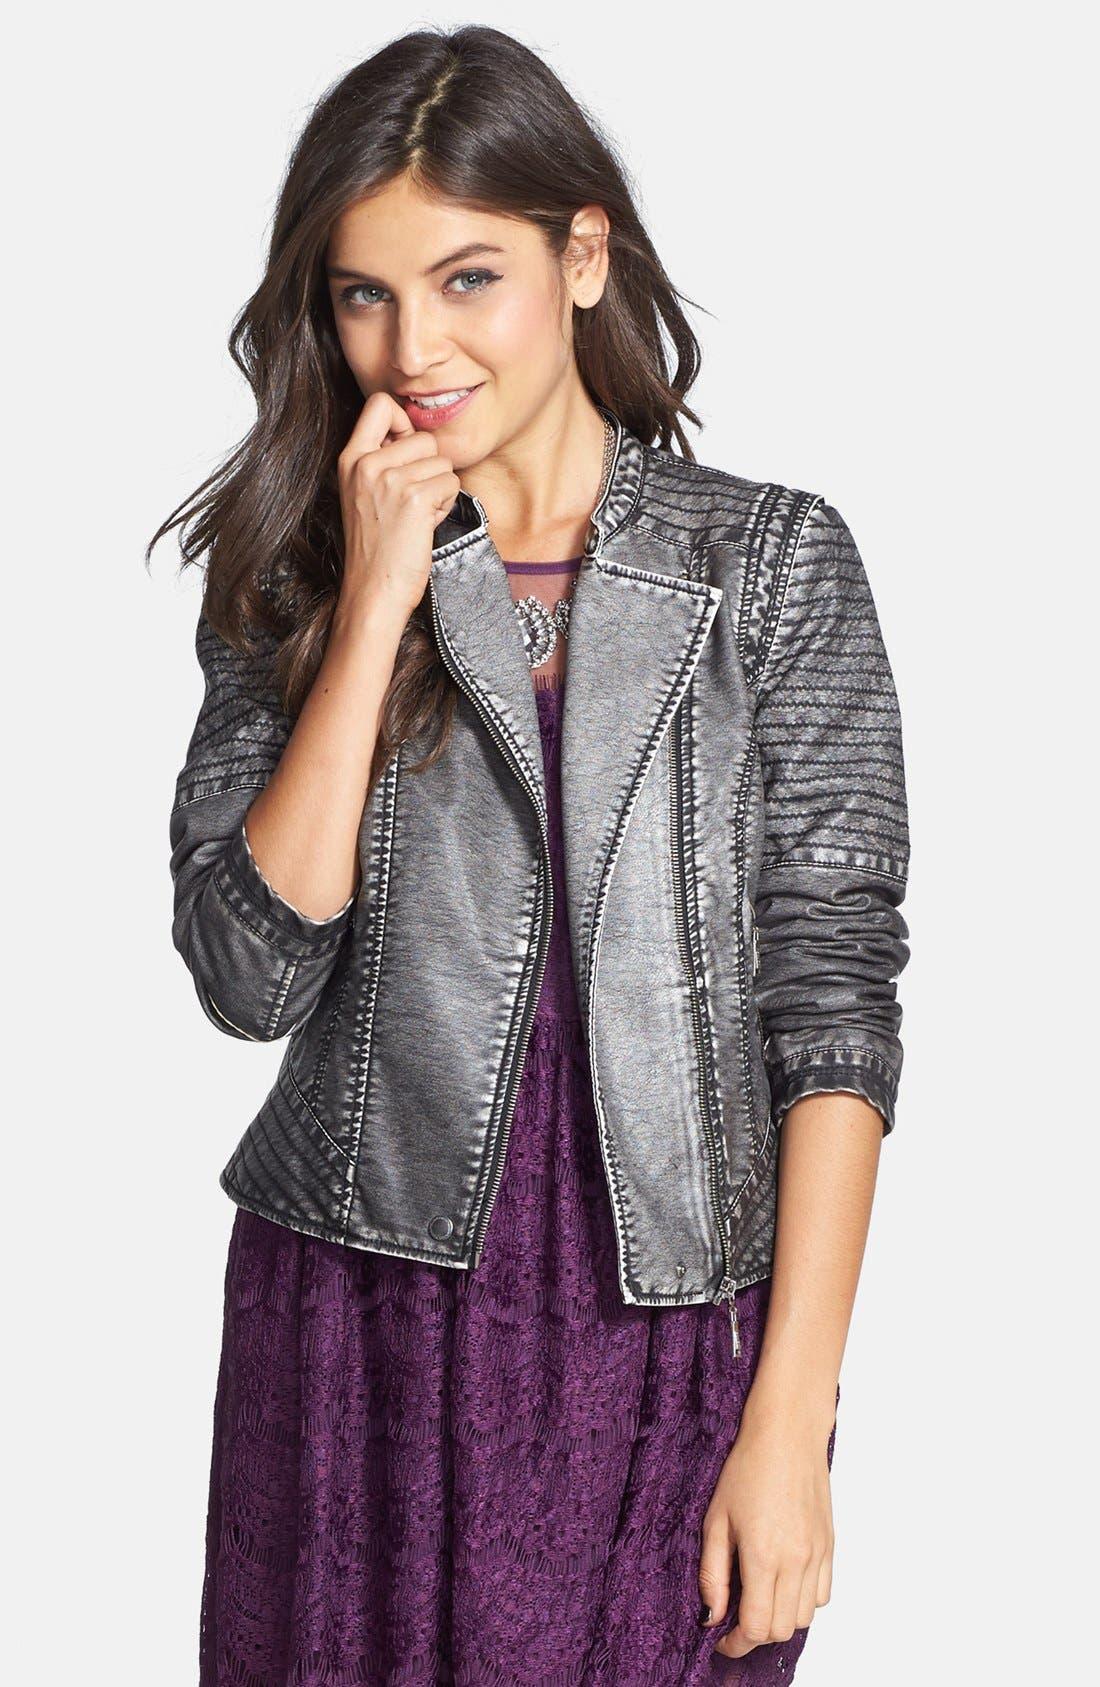 Alternate Image 1 Selected - Jou Jou Faux Leather Moto Jacket (Juniors)